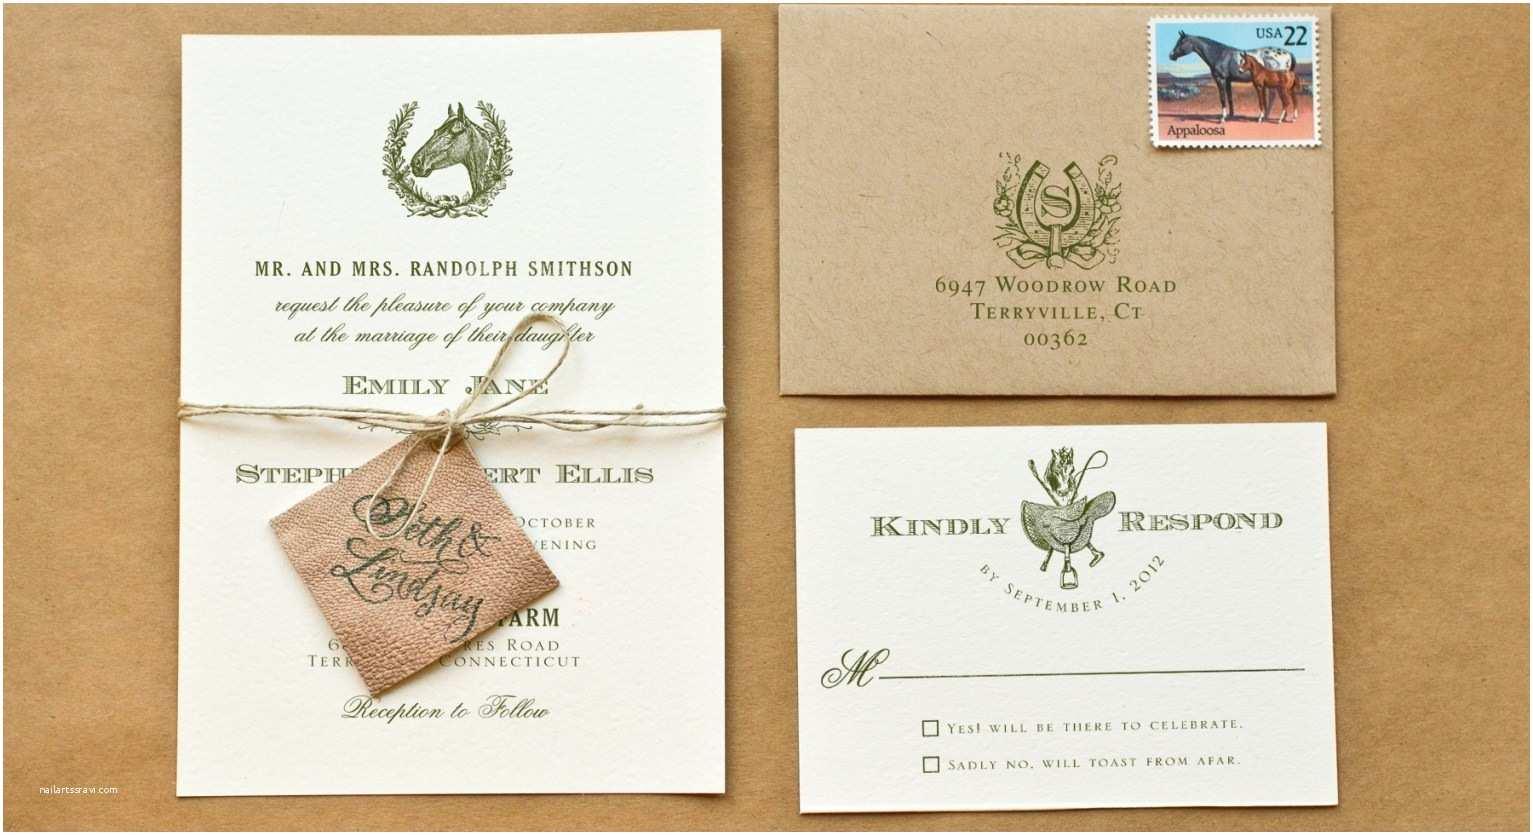 Print Your Own Wedding Invitations Wedding Print Your Own Wedding Invitations Exceptional